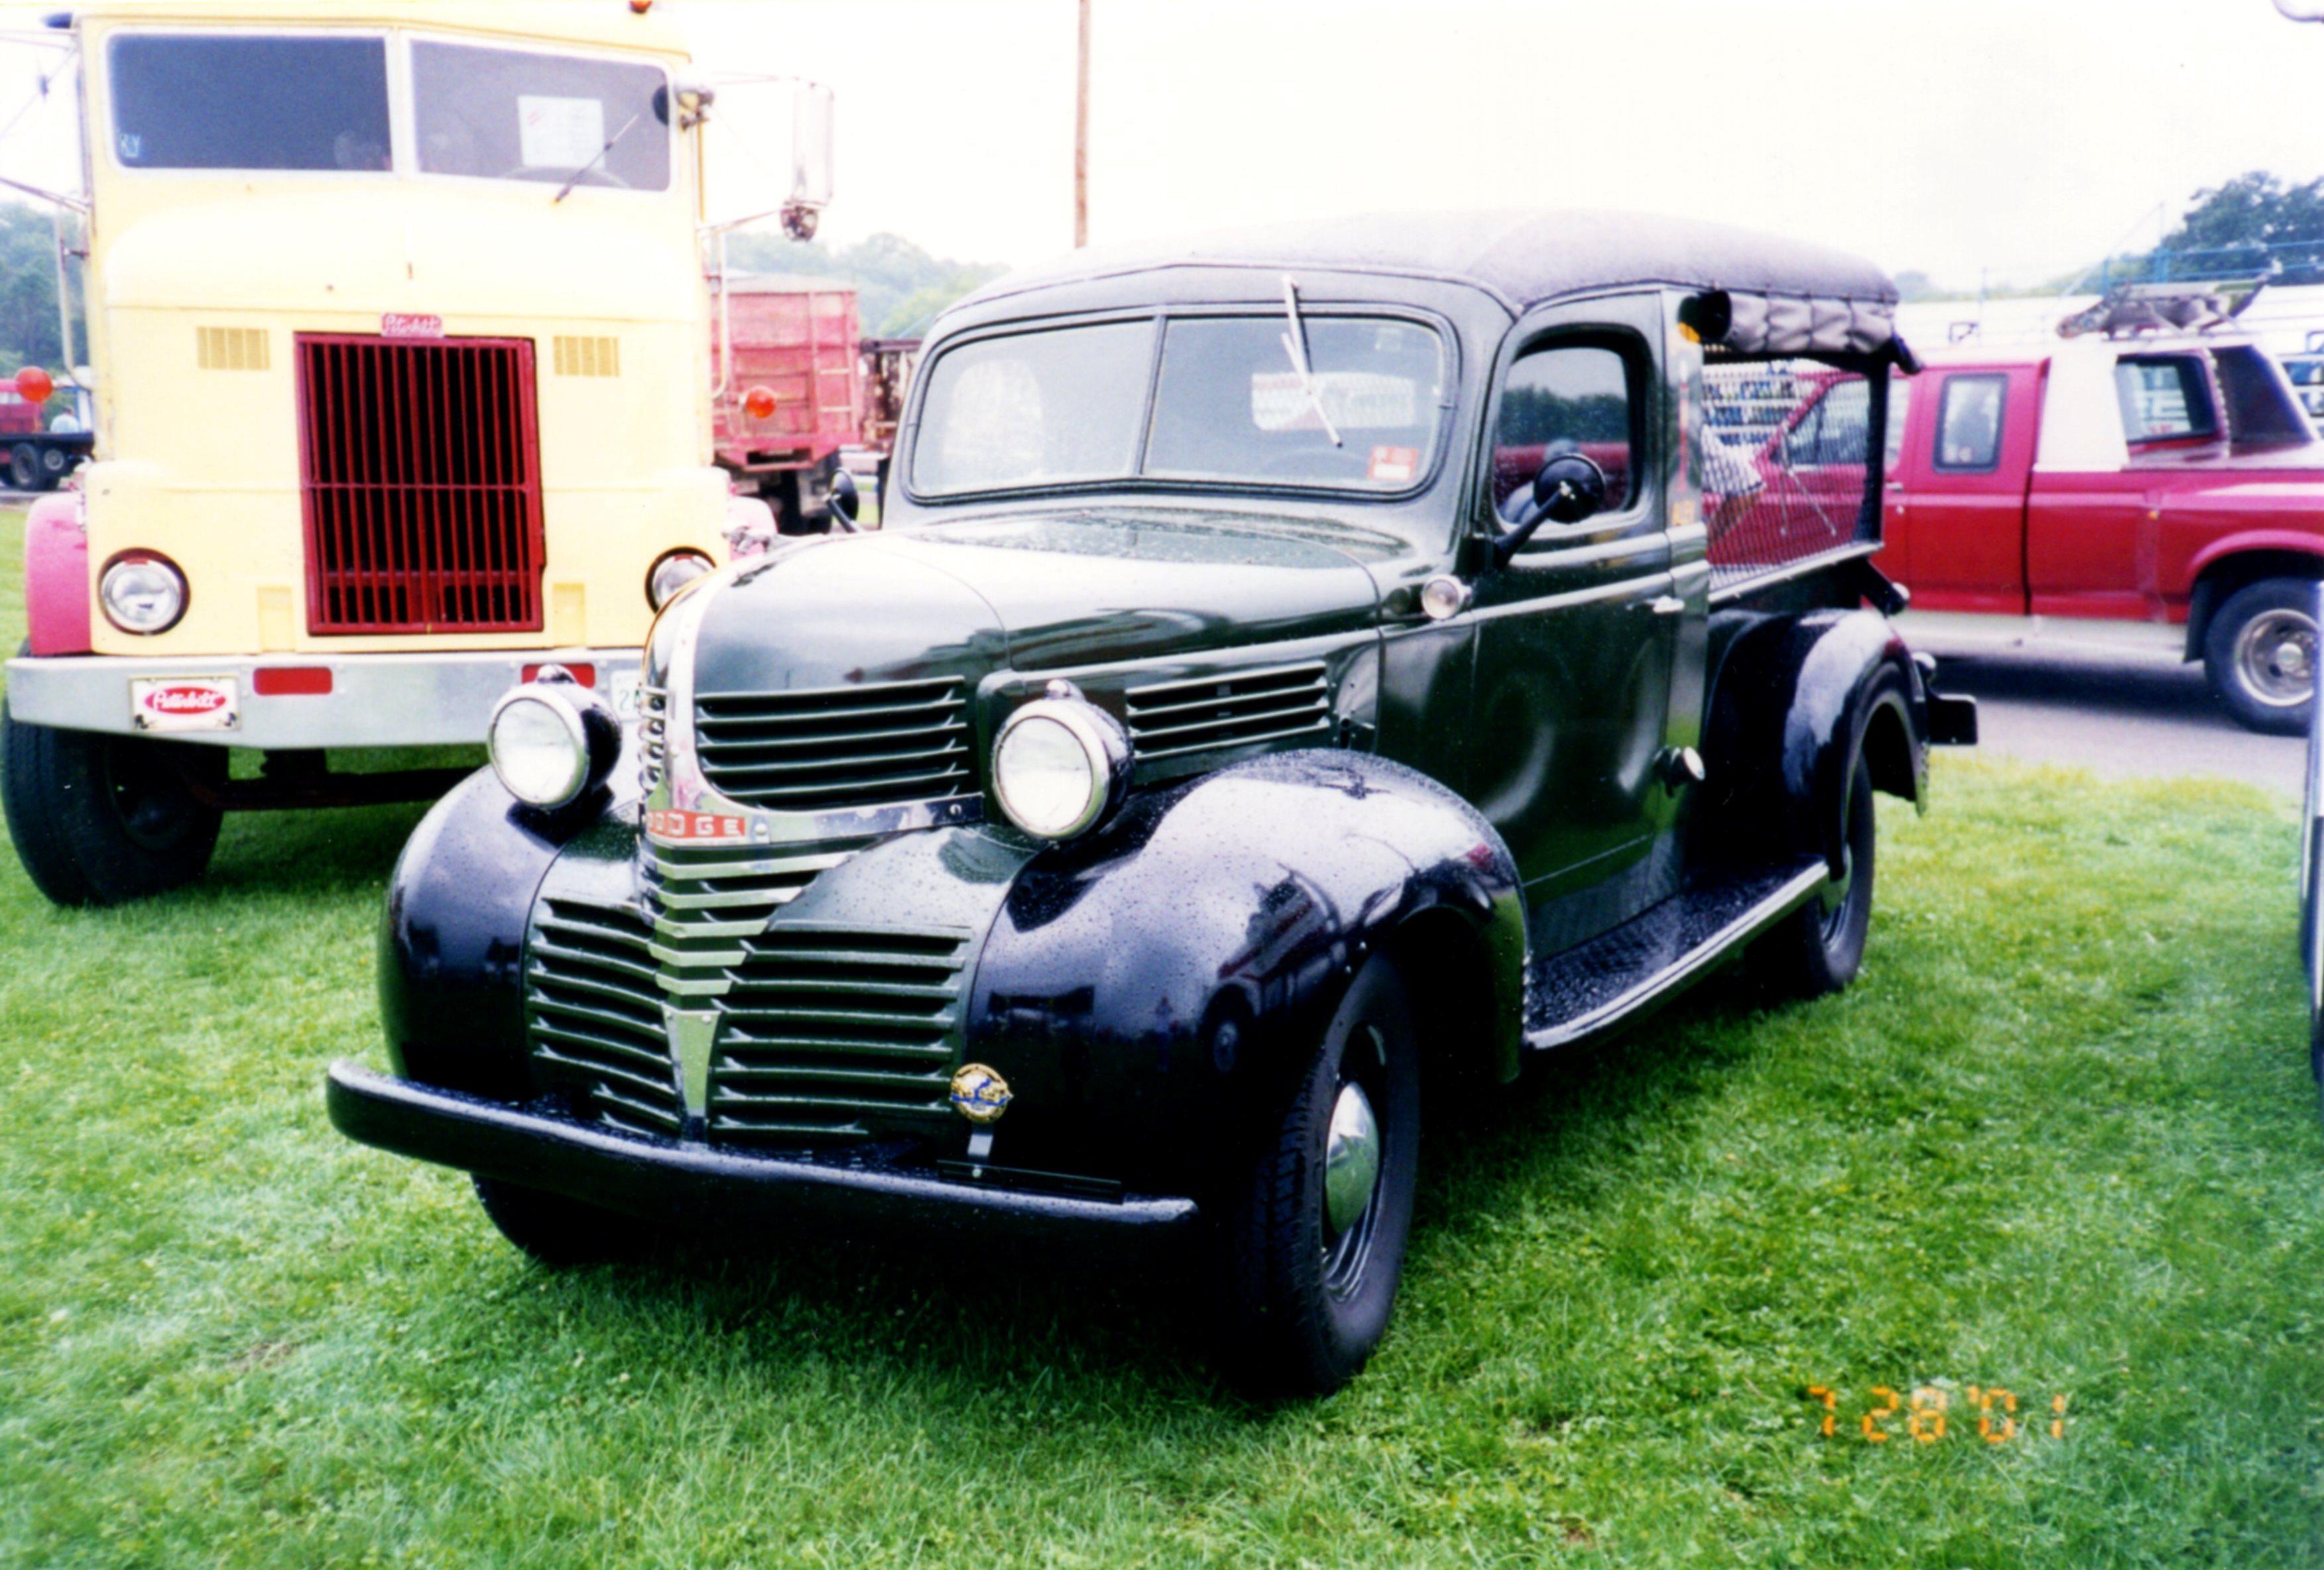 File1940 Dodge Canopy Express - 01.jpg & File:1940 Dodge Canopy Express - 01.jpg - Wikimedia Commons